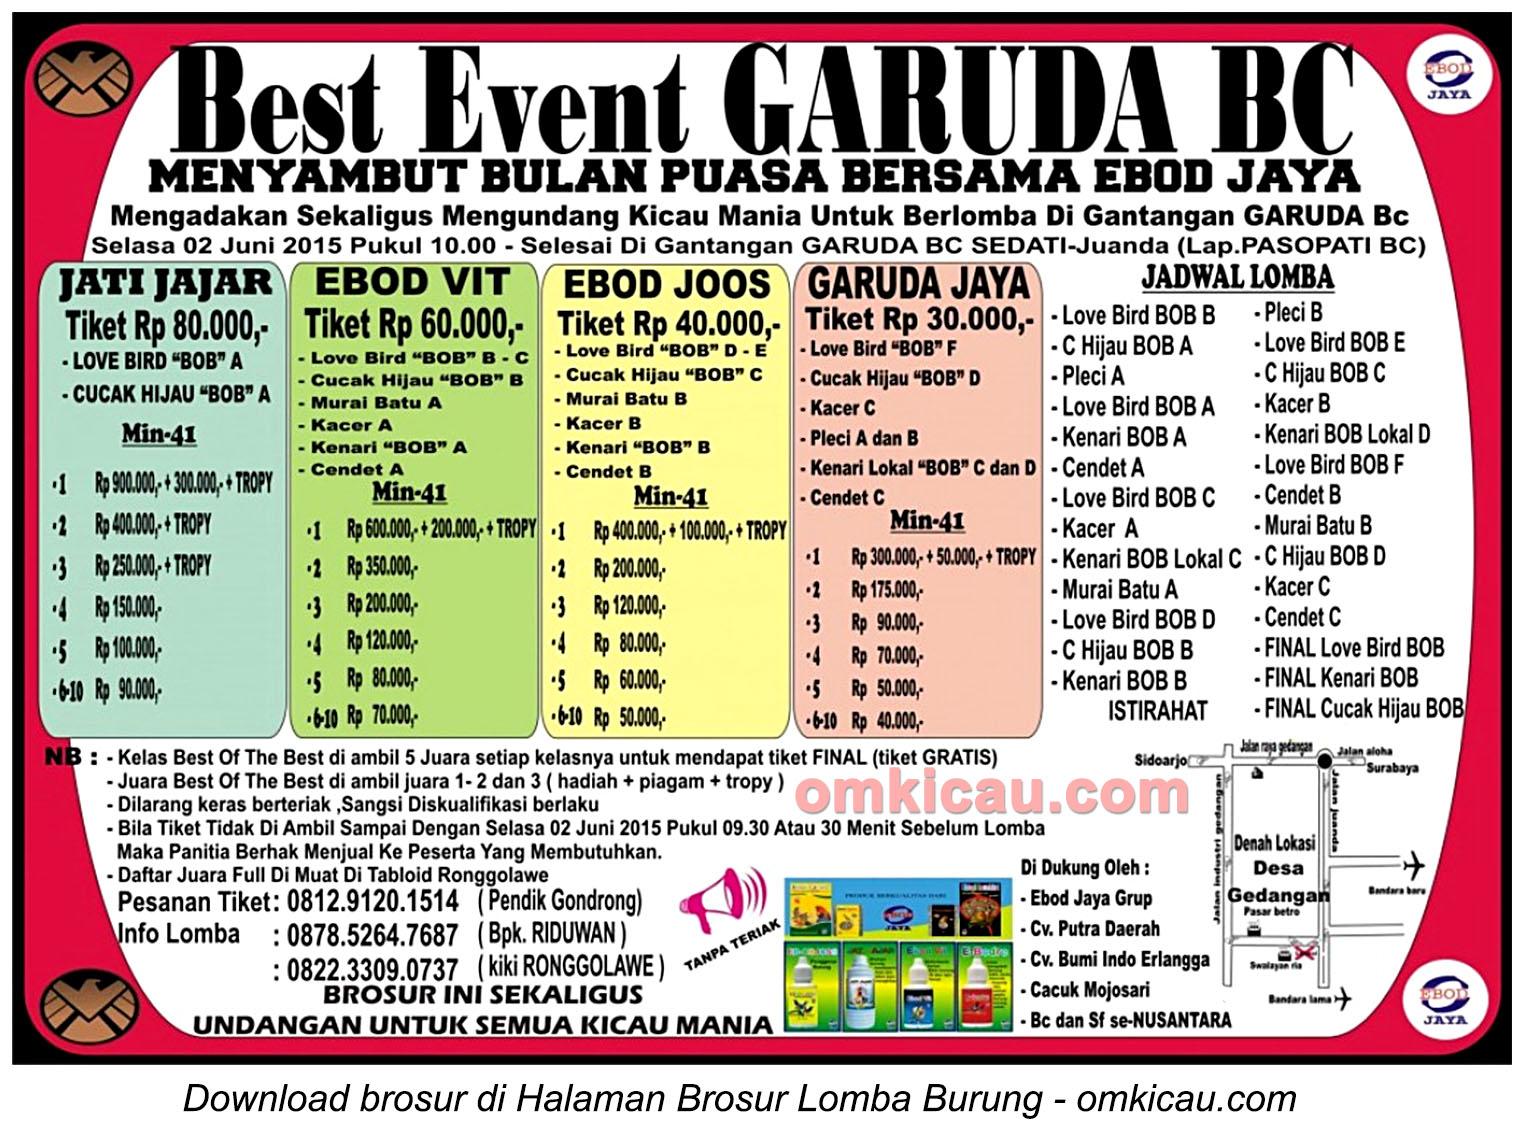 Brosur Lomba Burung Berkicau Best Event Garuda BC, Sidoarjo, 2 Juni 2015